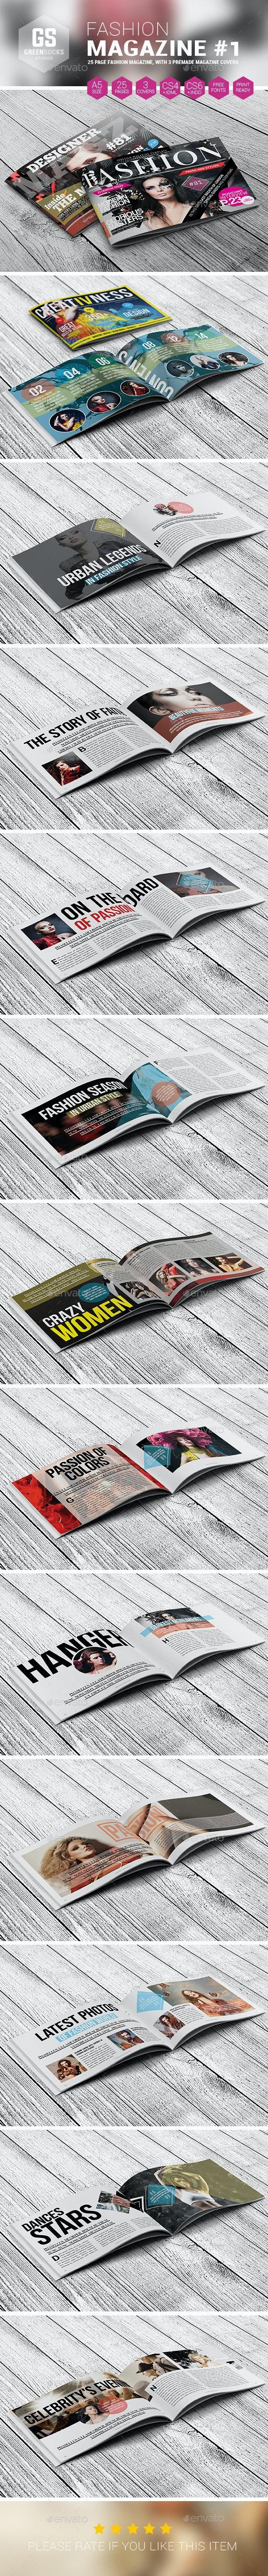 Landscape Fashion Magazine #1 - Magazines Print Templates